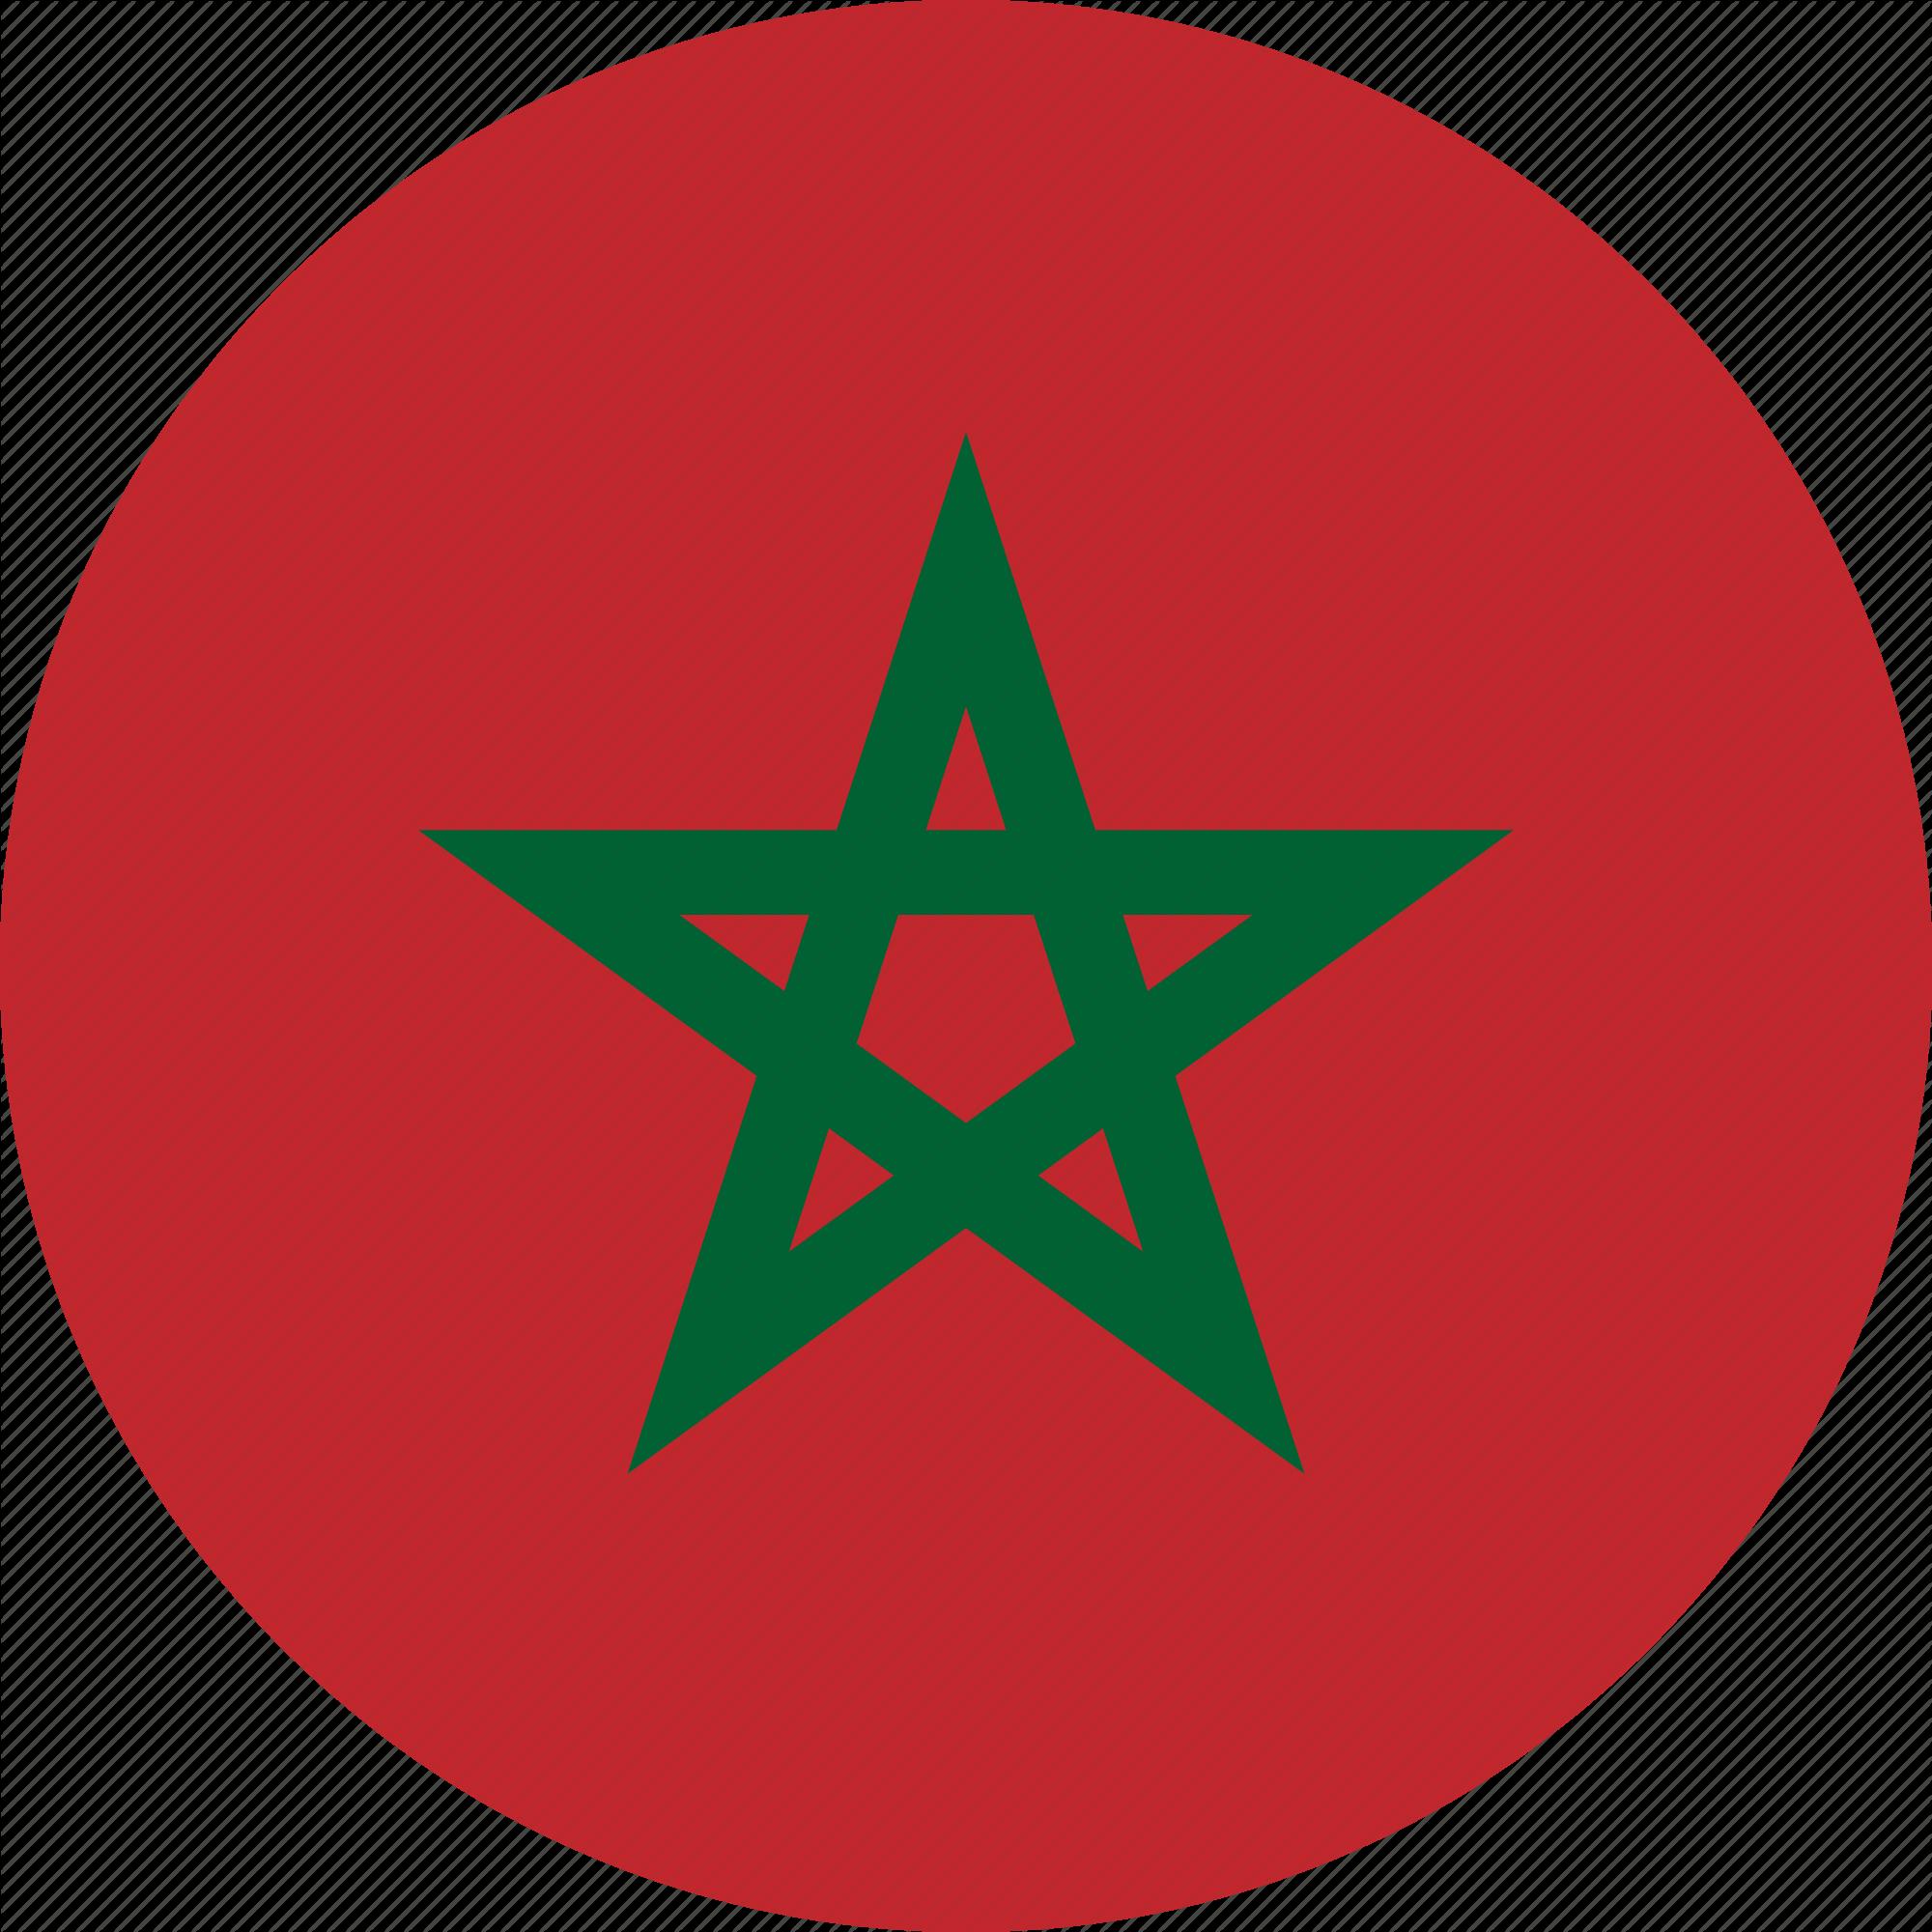 Download Morocco Flag Png HQ PNG Image | FreePNGImg